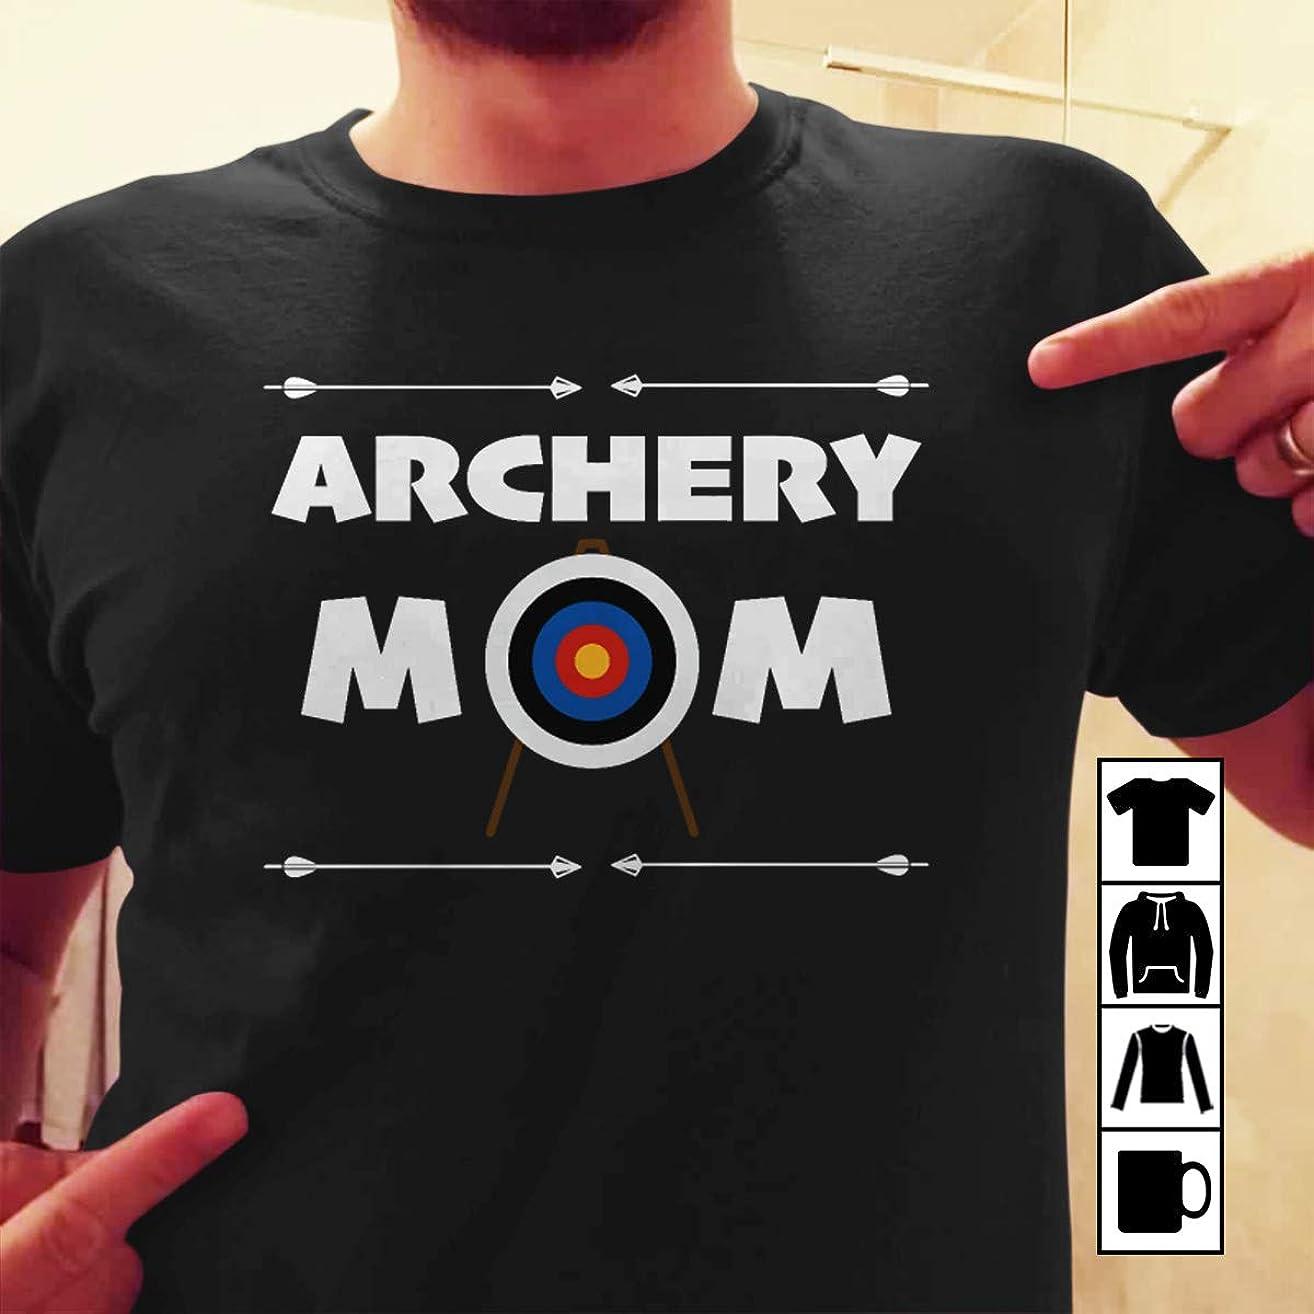 Bowman Archer Archery Mom funny target T Shirt Long Sleeve Sweatshirt Hoodie Youth